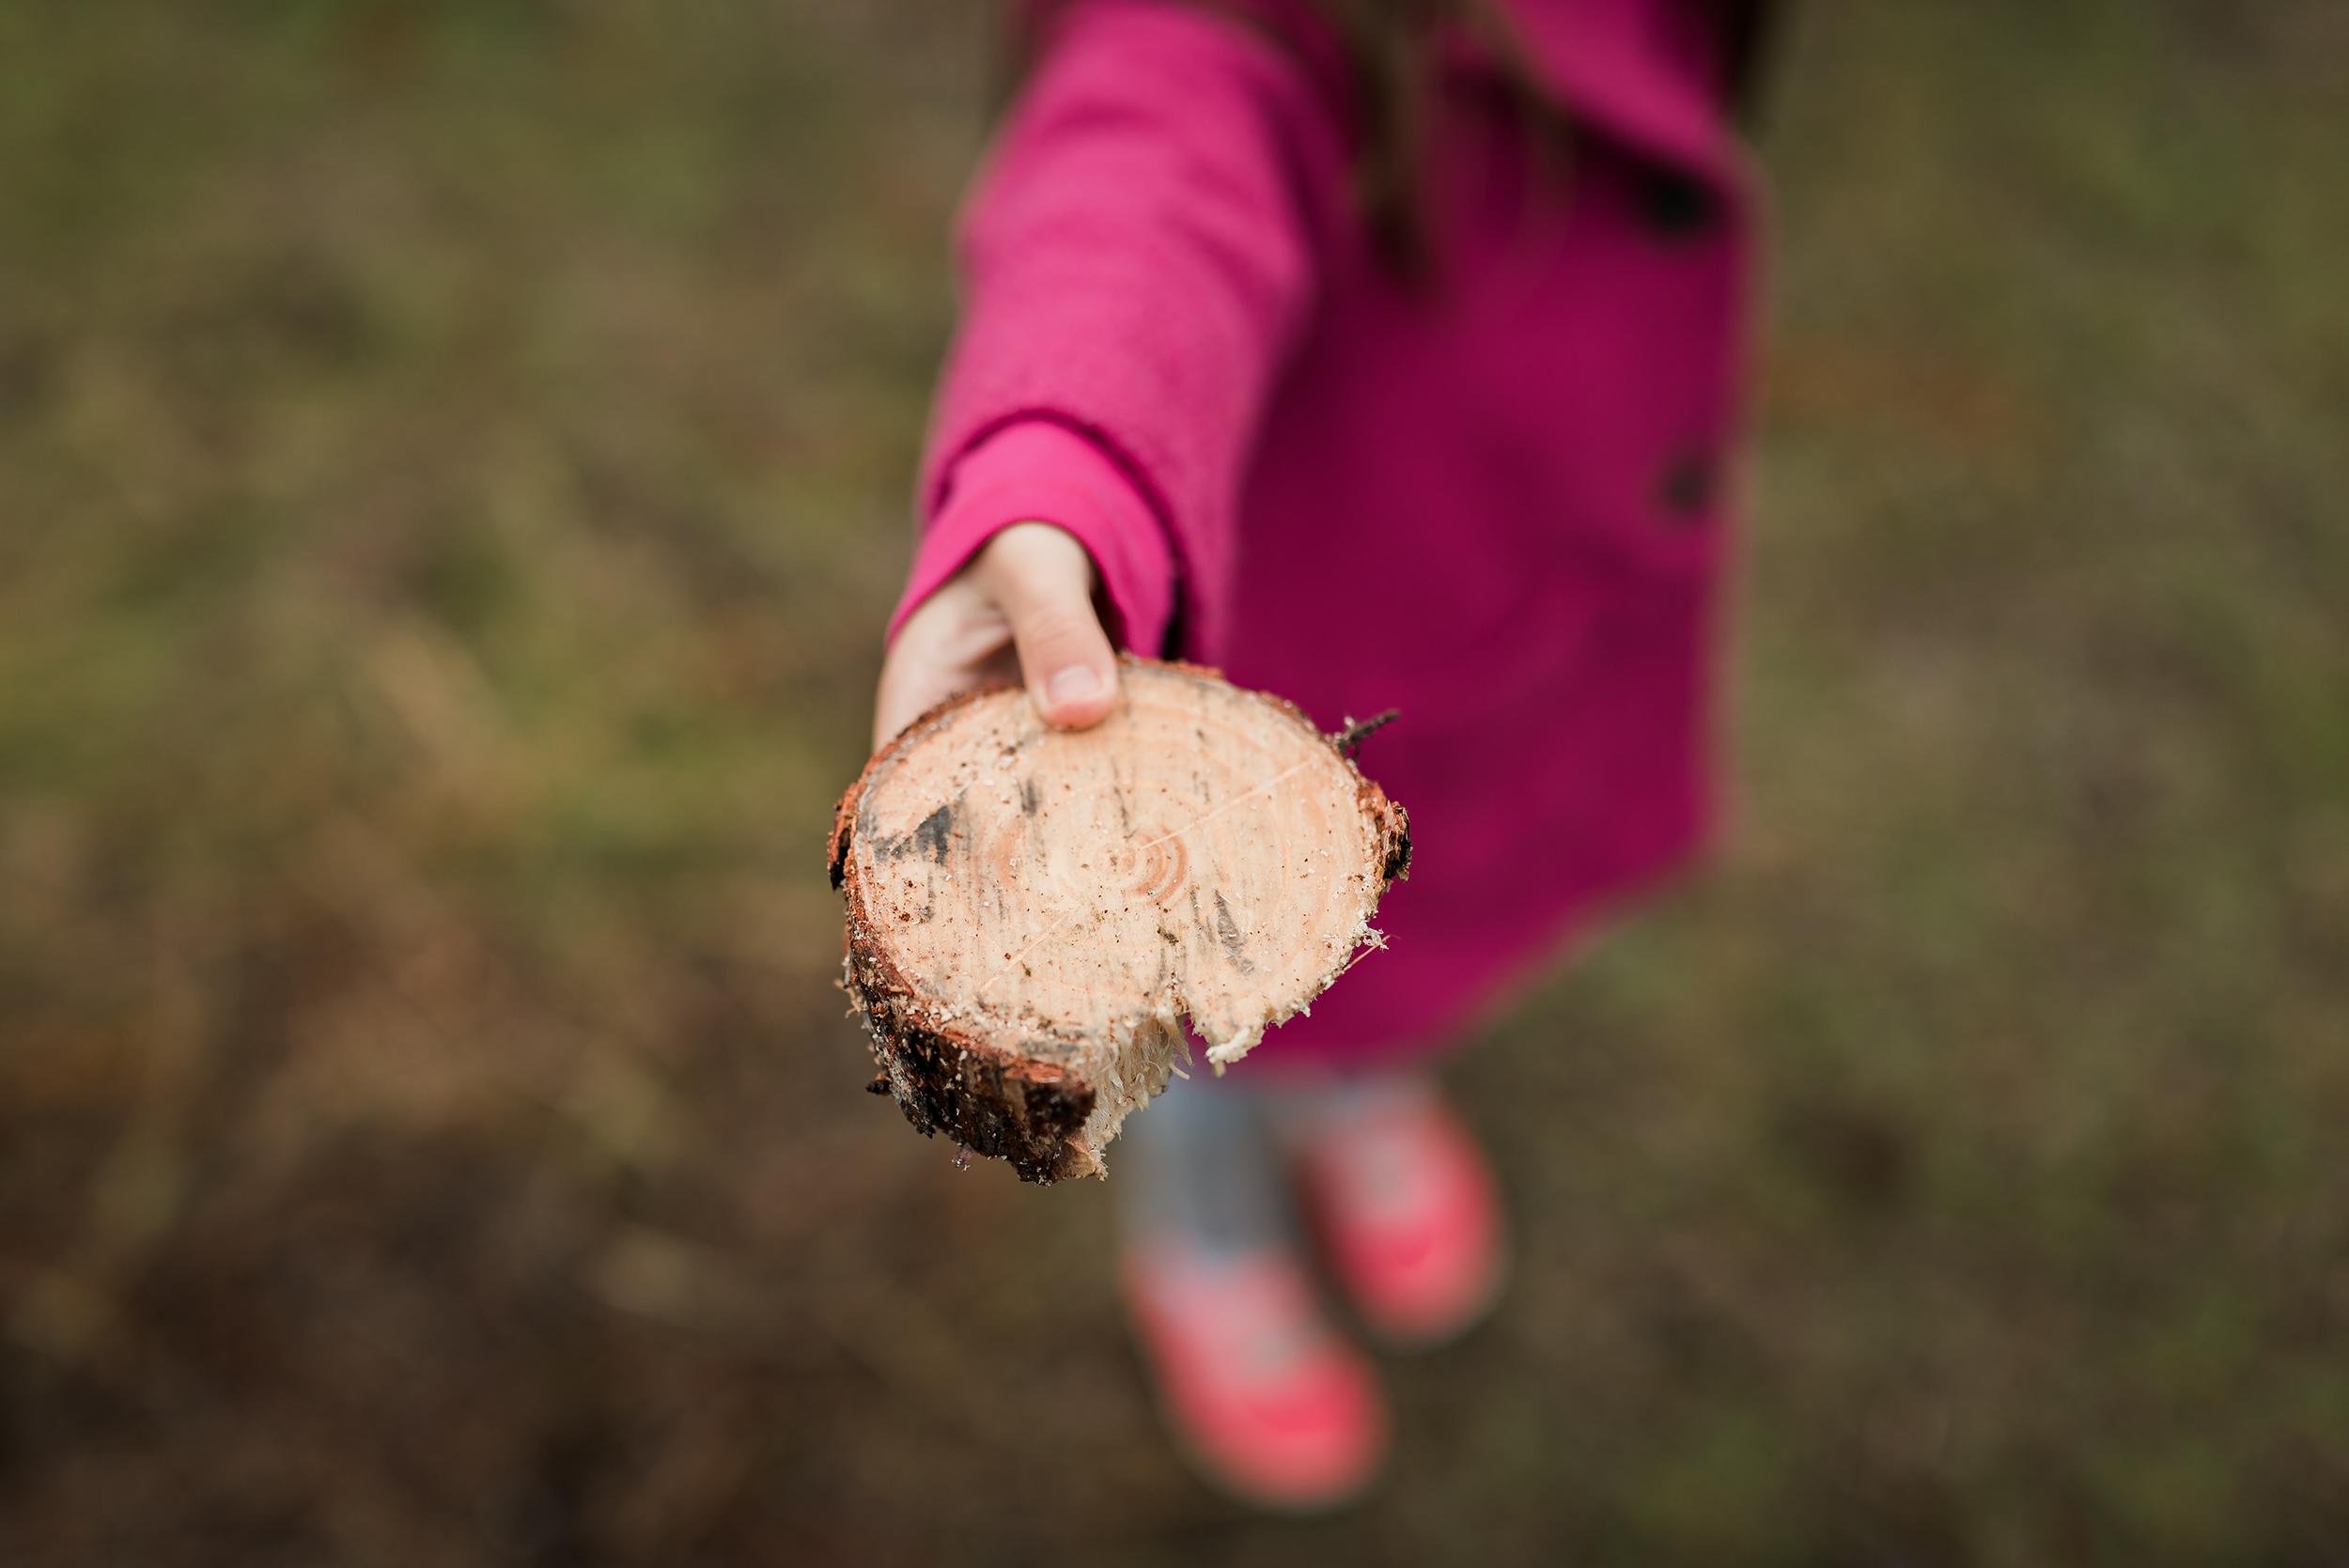 eden-holding-tree-cutting-virginia-pine-web.jpg